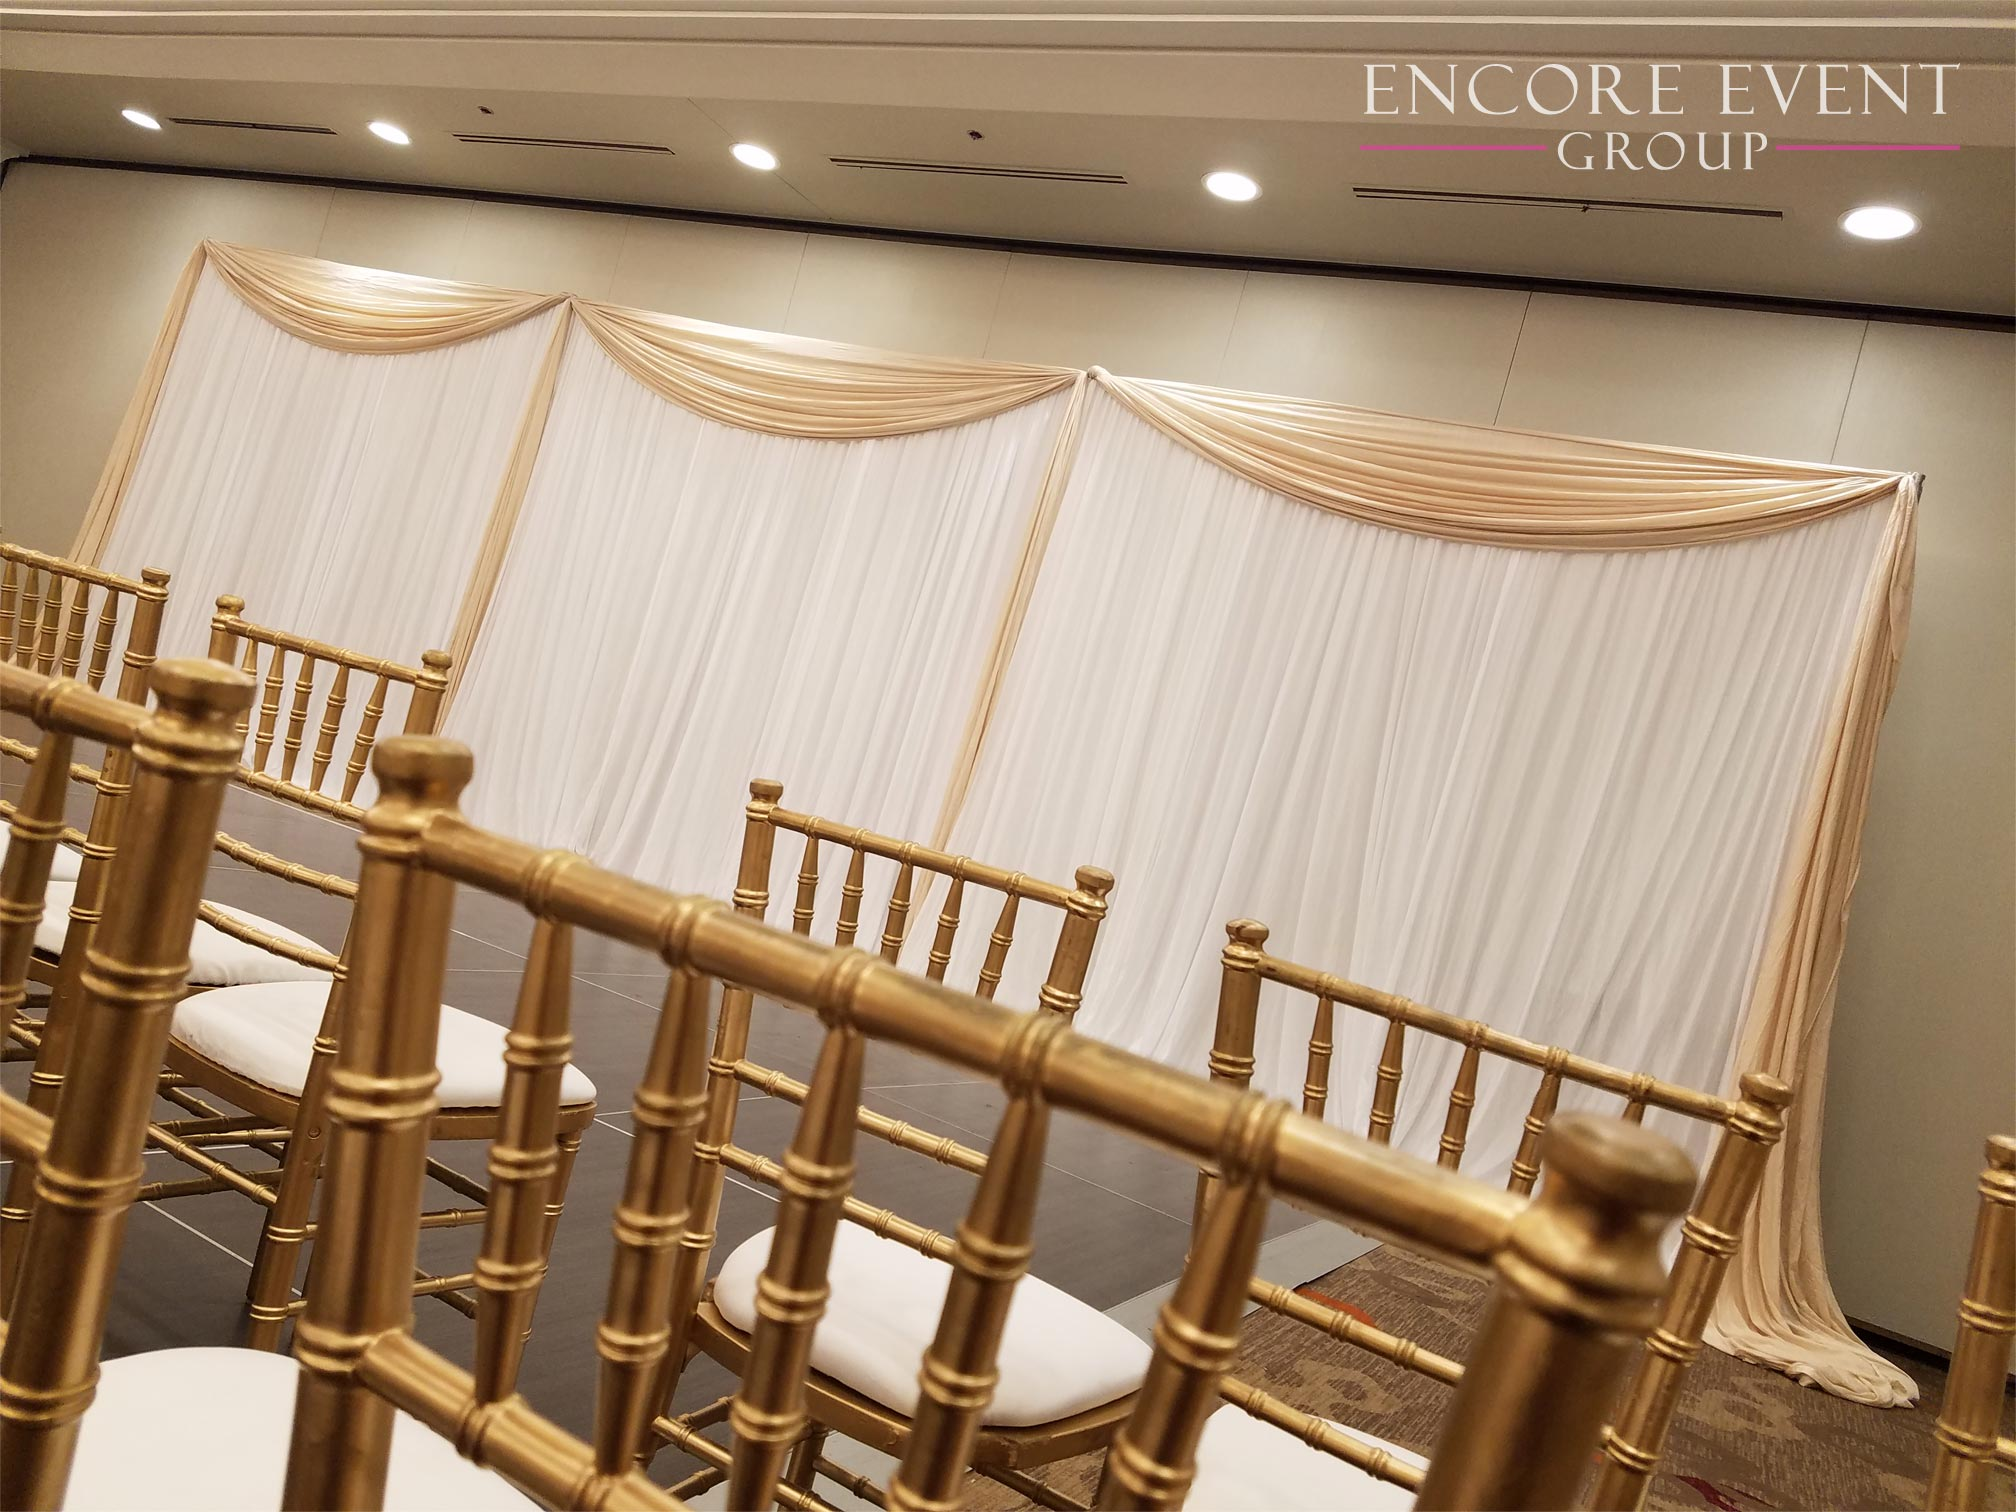 Hotel Baronette Novi Wedding Drapes Encore Event Group